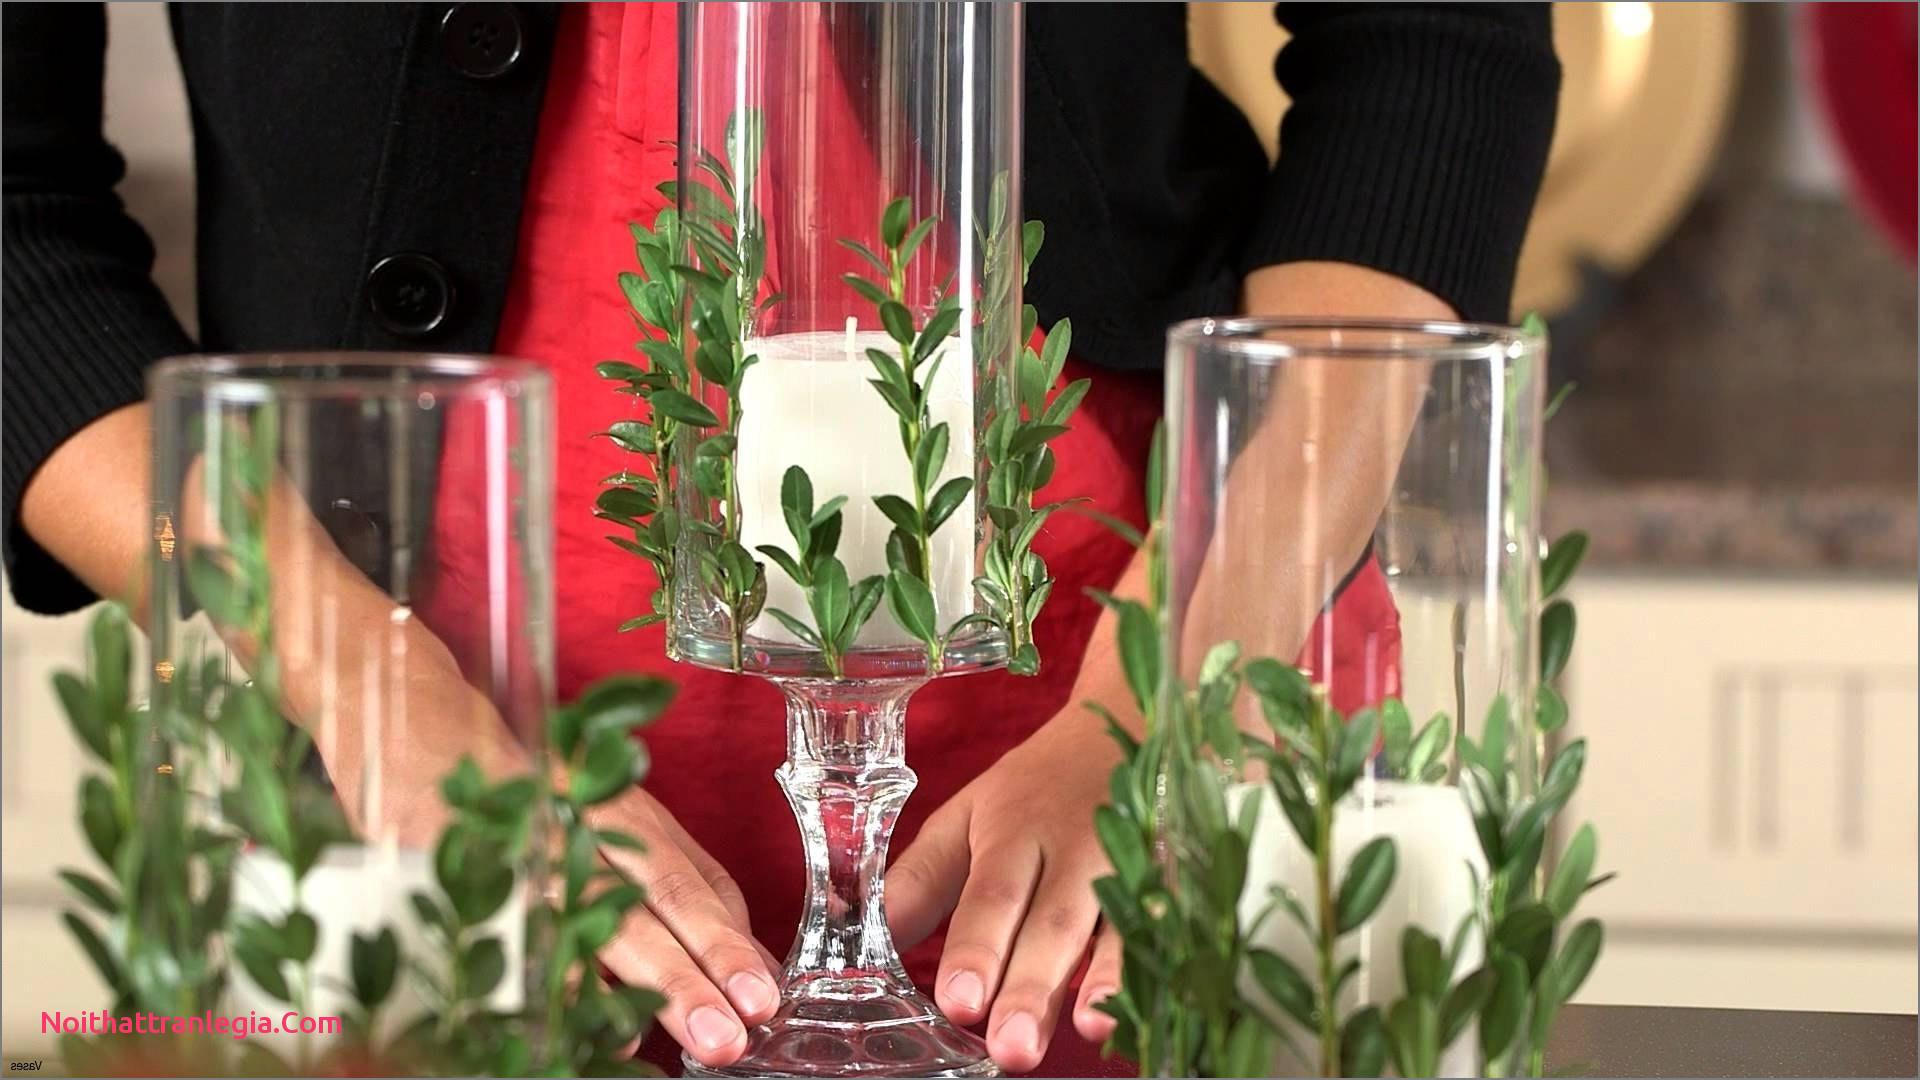 large vase flower arrangement ideas of 20 wedding vases noithattranlegia vases design with regard to wedding centerpiece decoration ideas unique dollar tree wedding decorations awesome h vases dollar vase i 0d